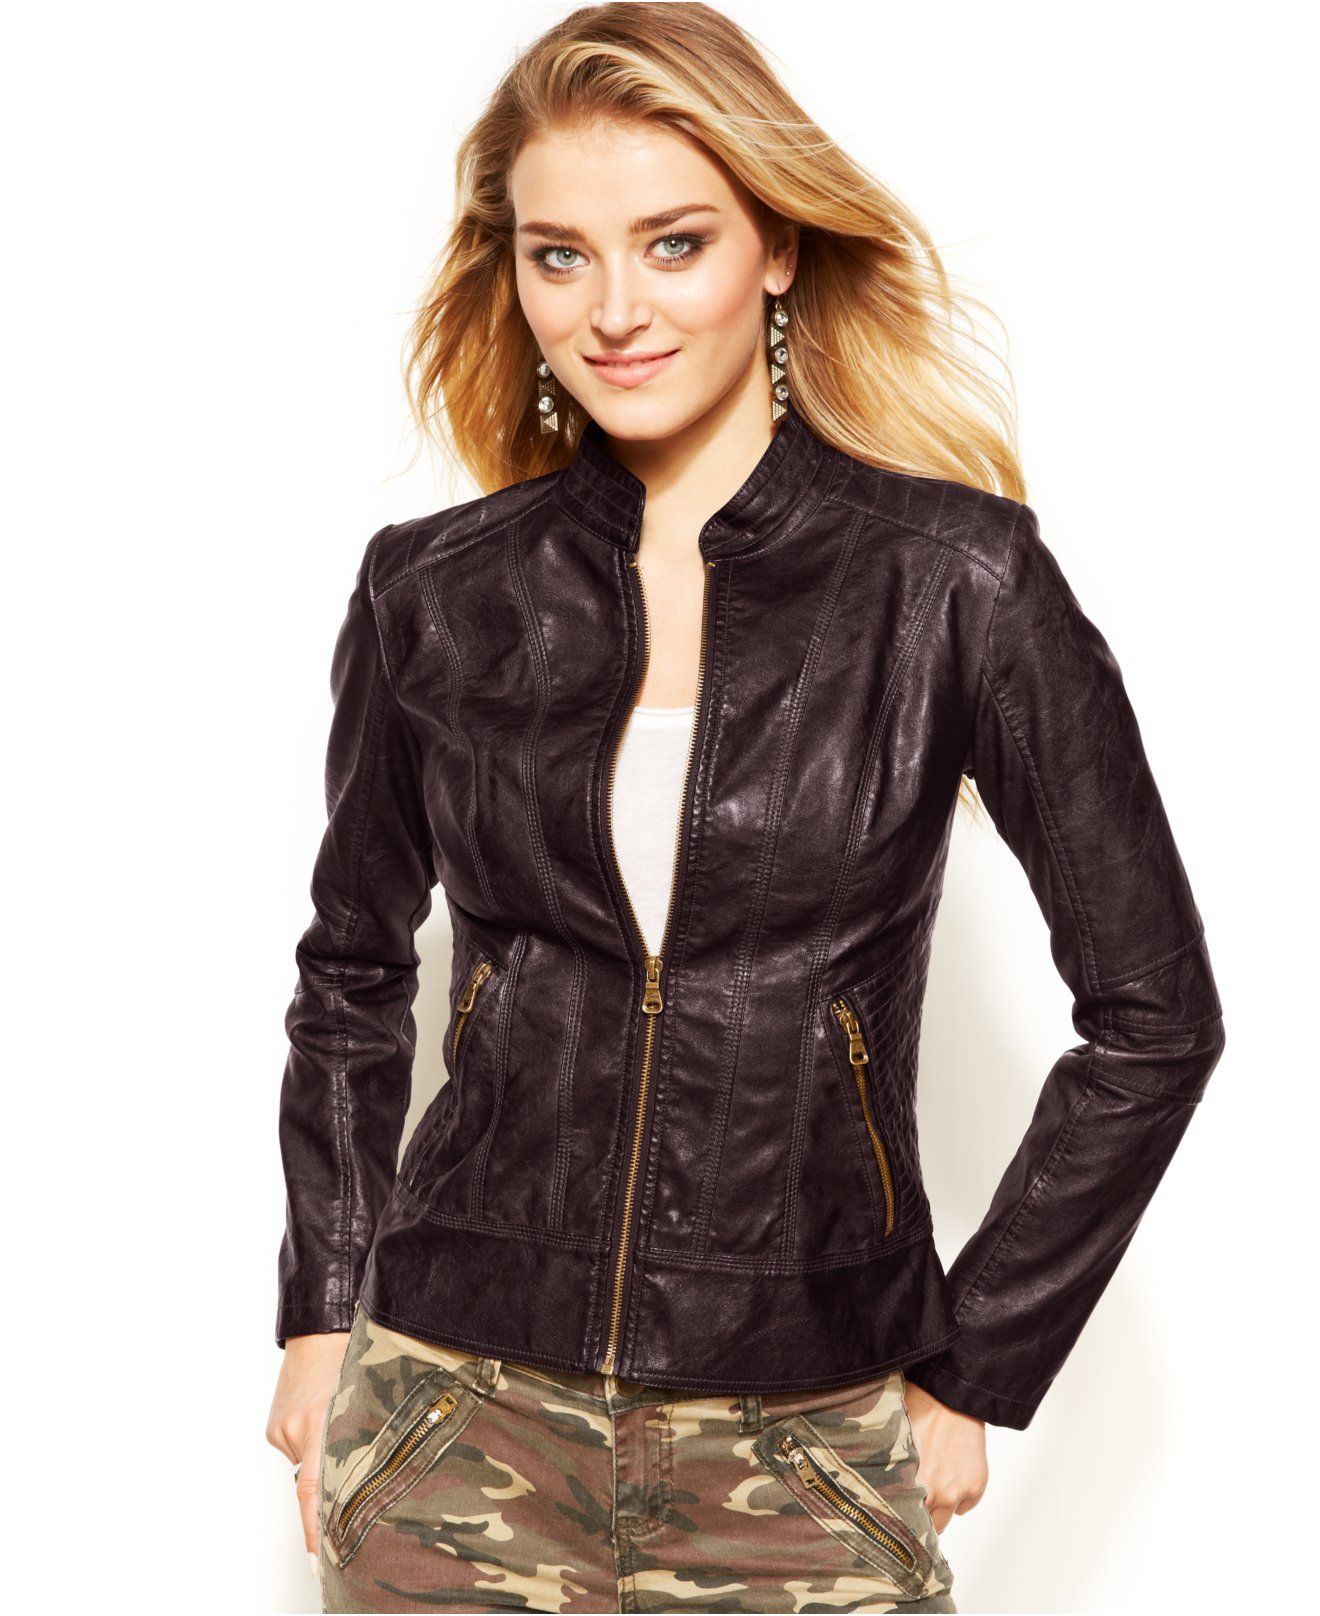 GUESS FauxLeather Jacket Coats Women Macy's